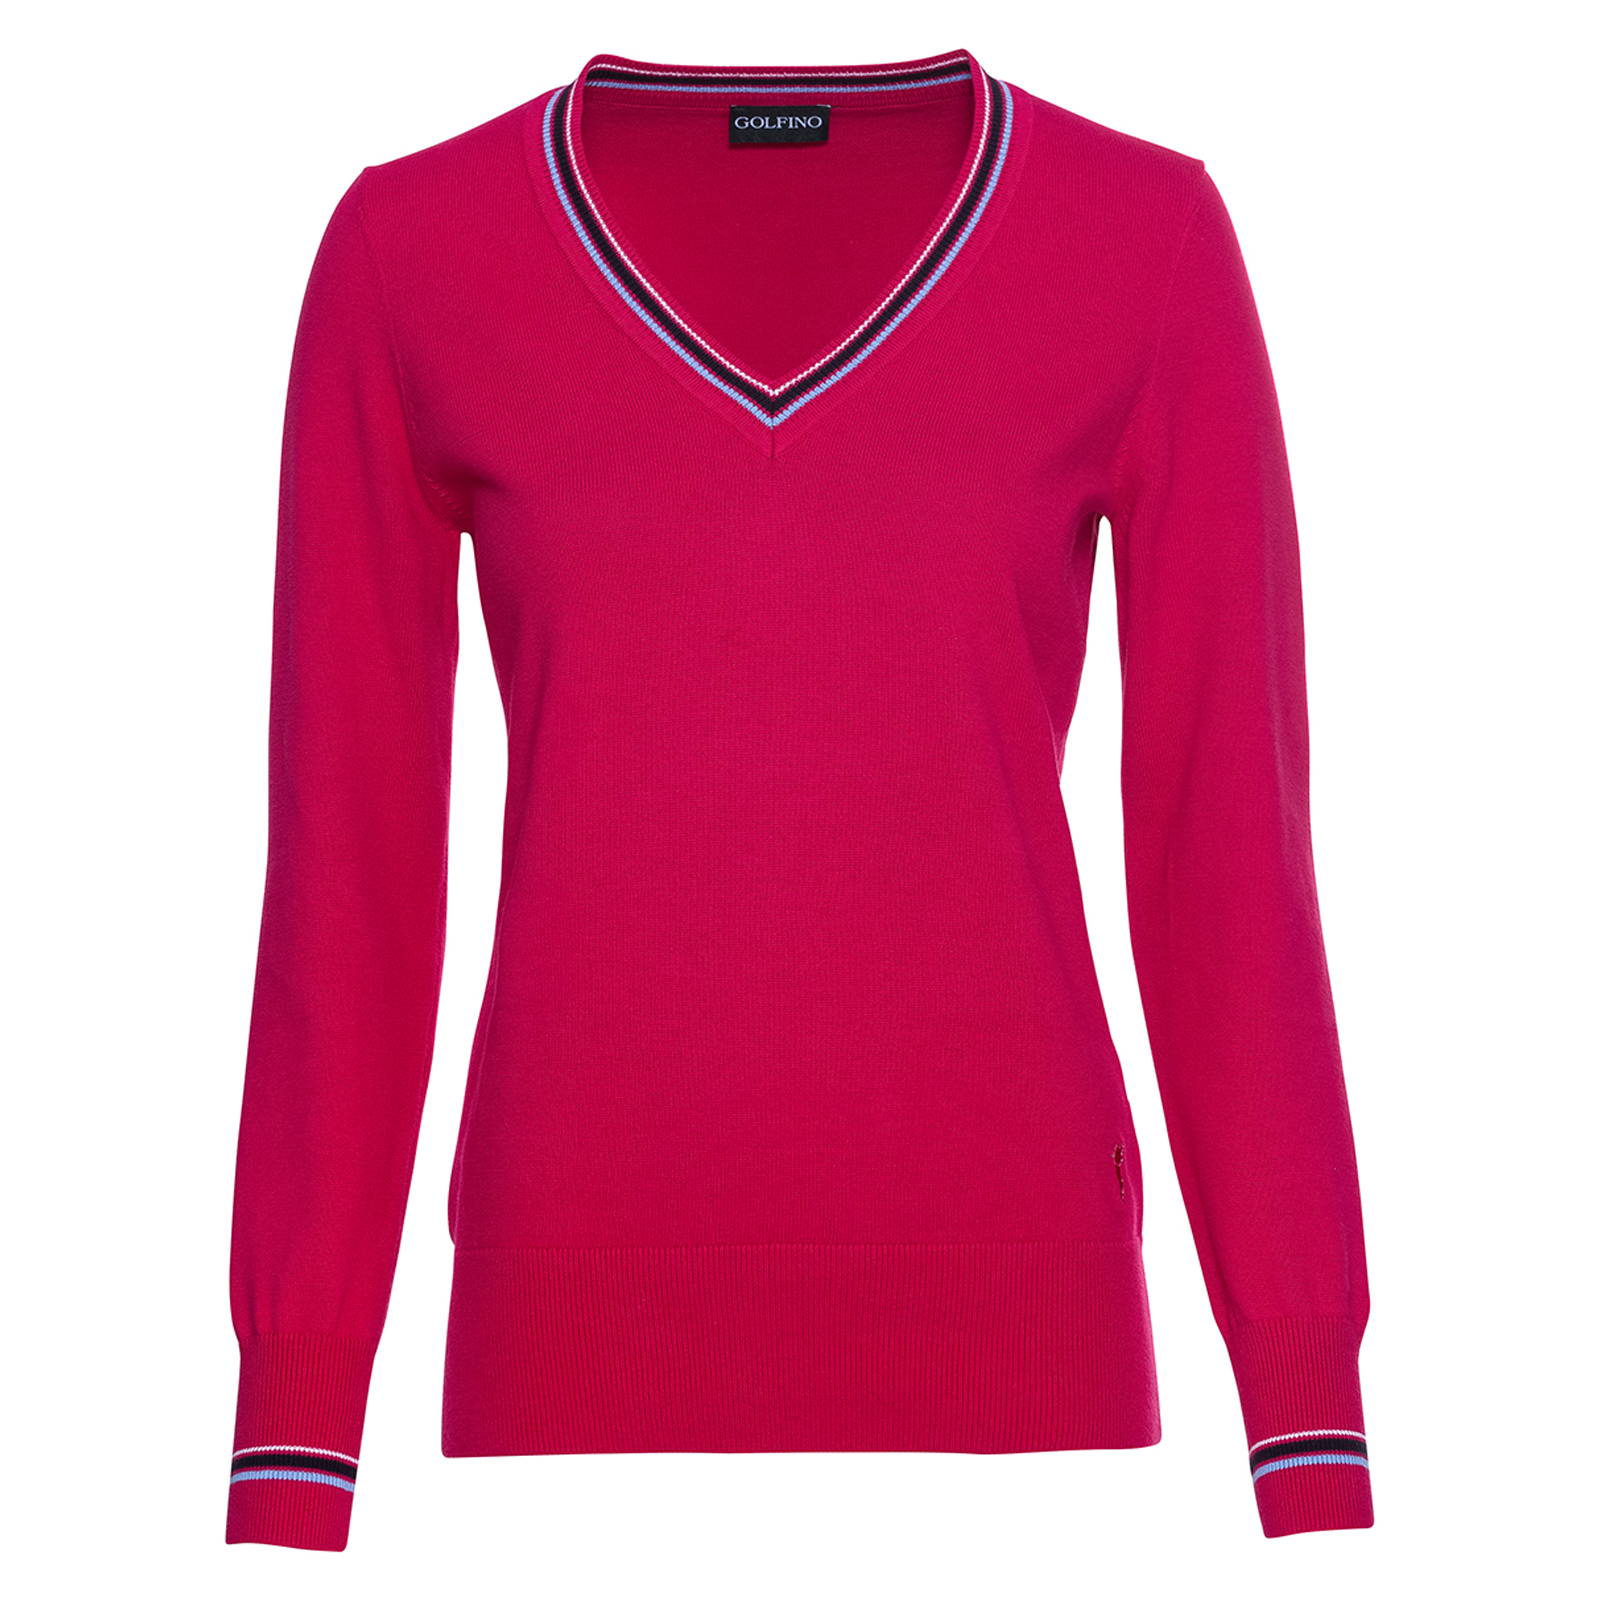 Besonders komfortabler Damen Sweater